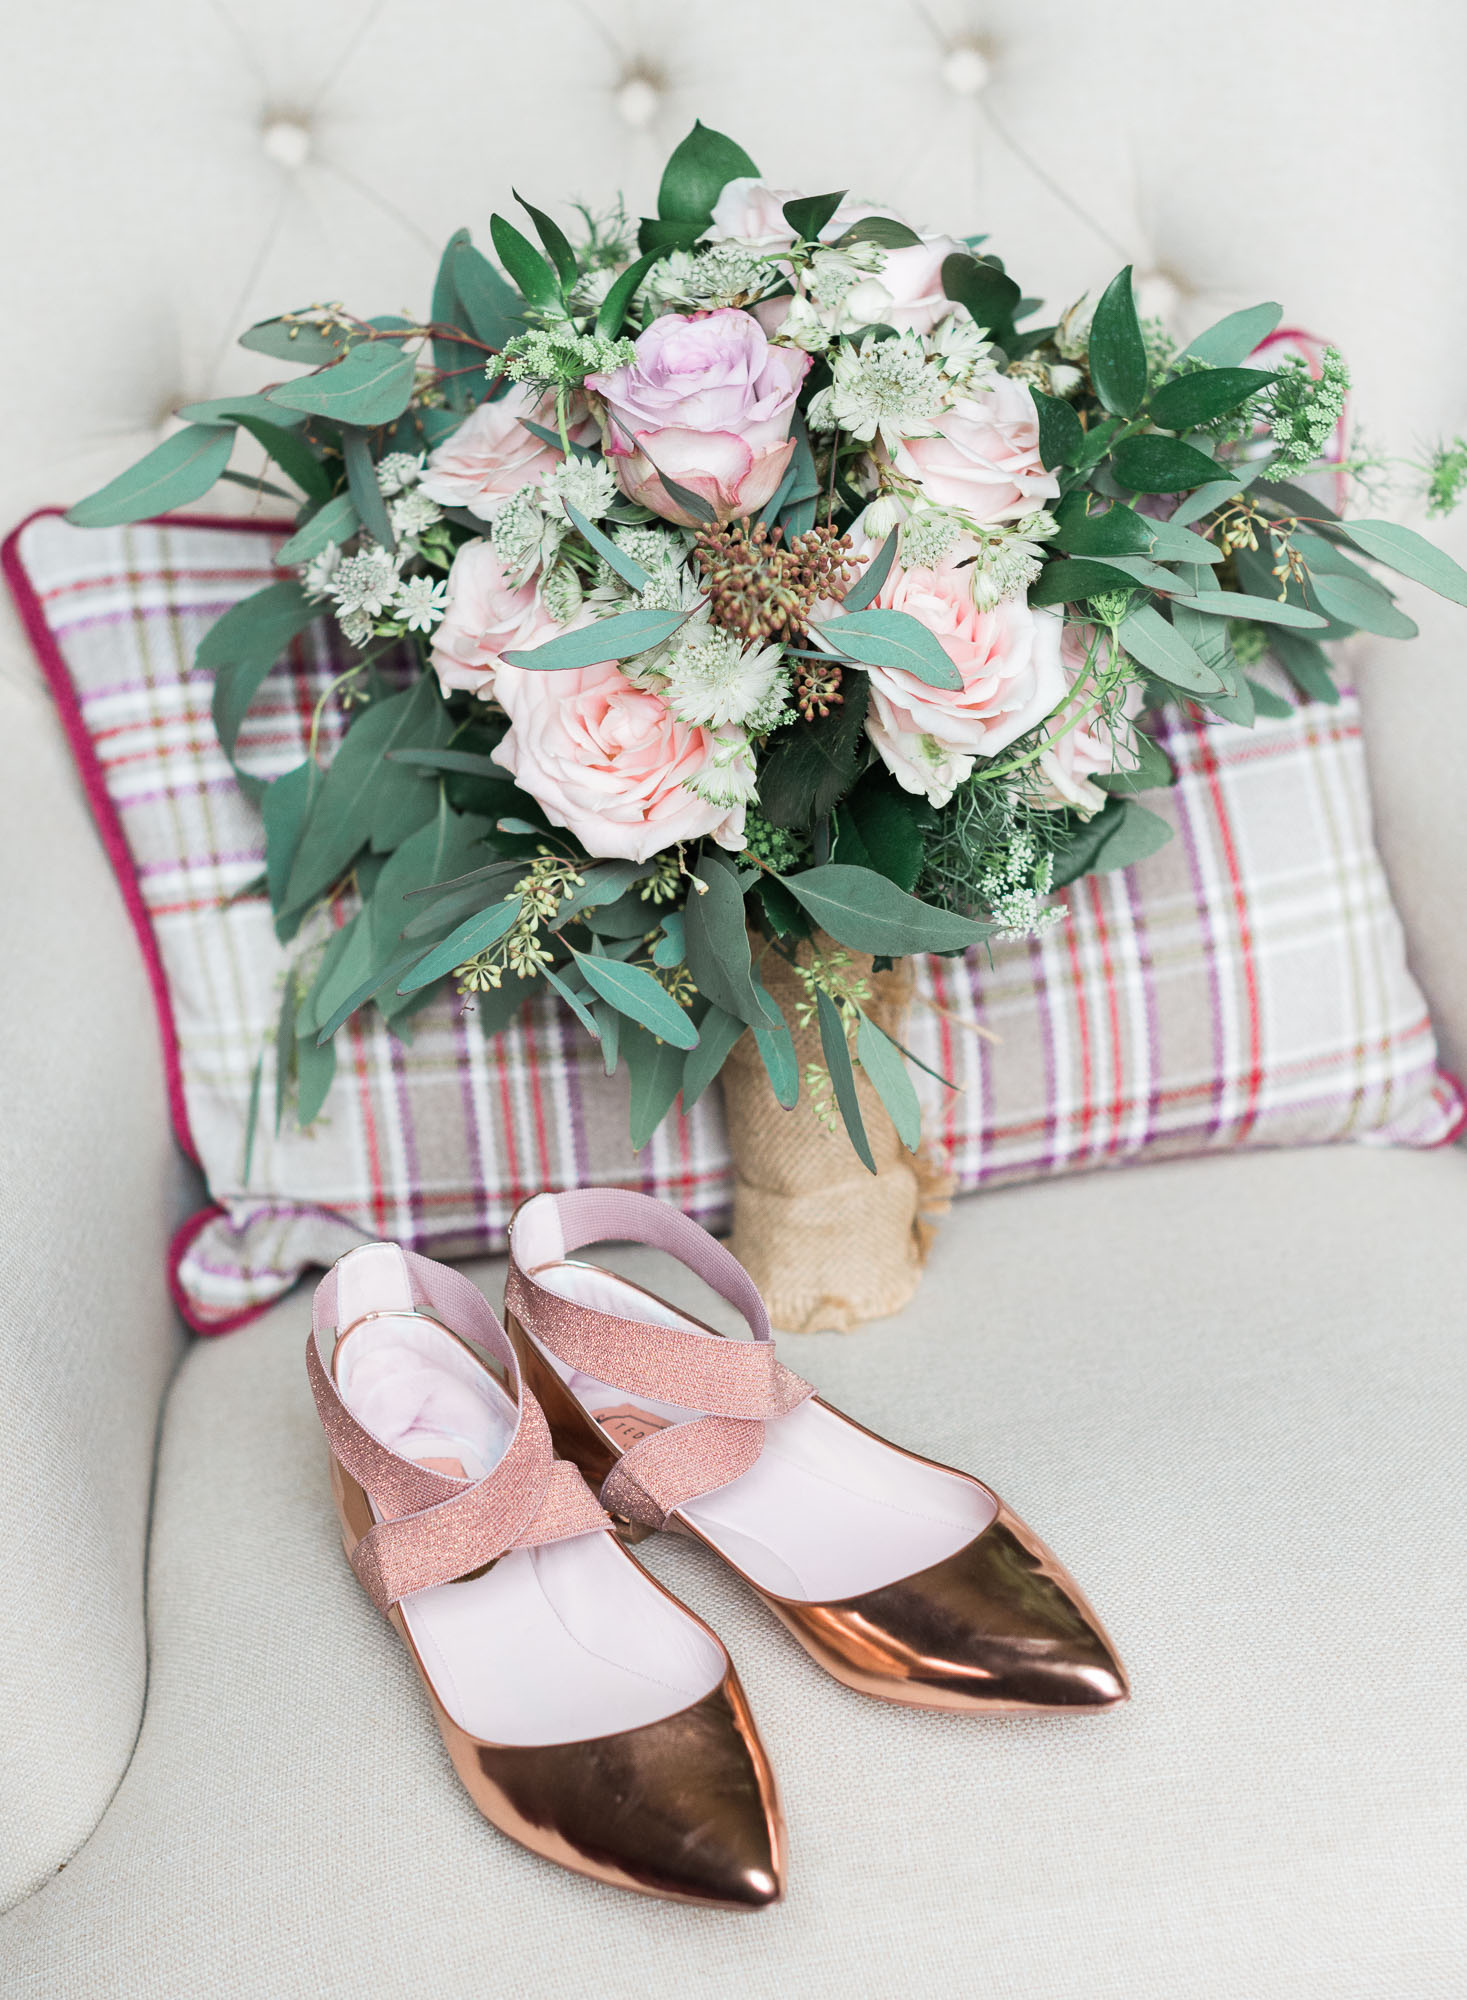 scottish_wedding_blairquhan_castle-10.jpg